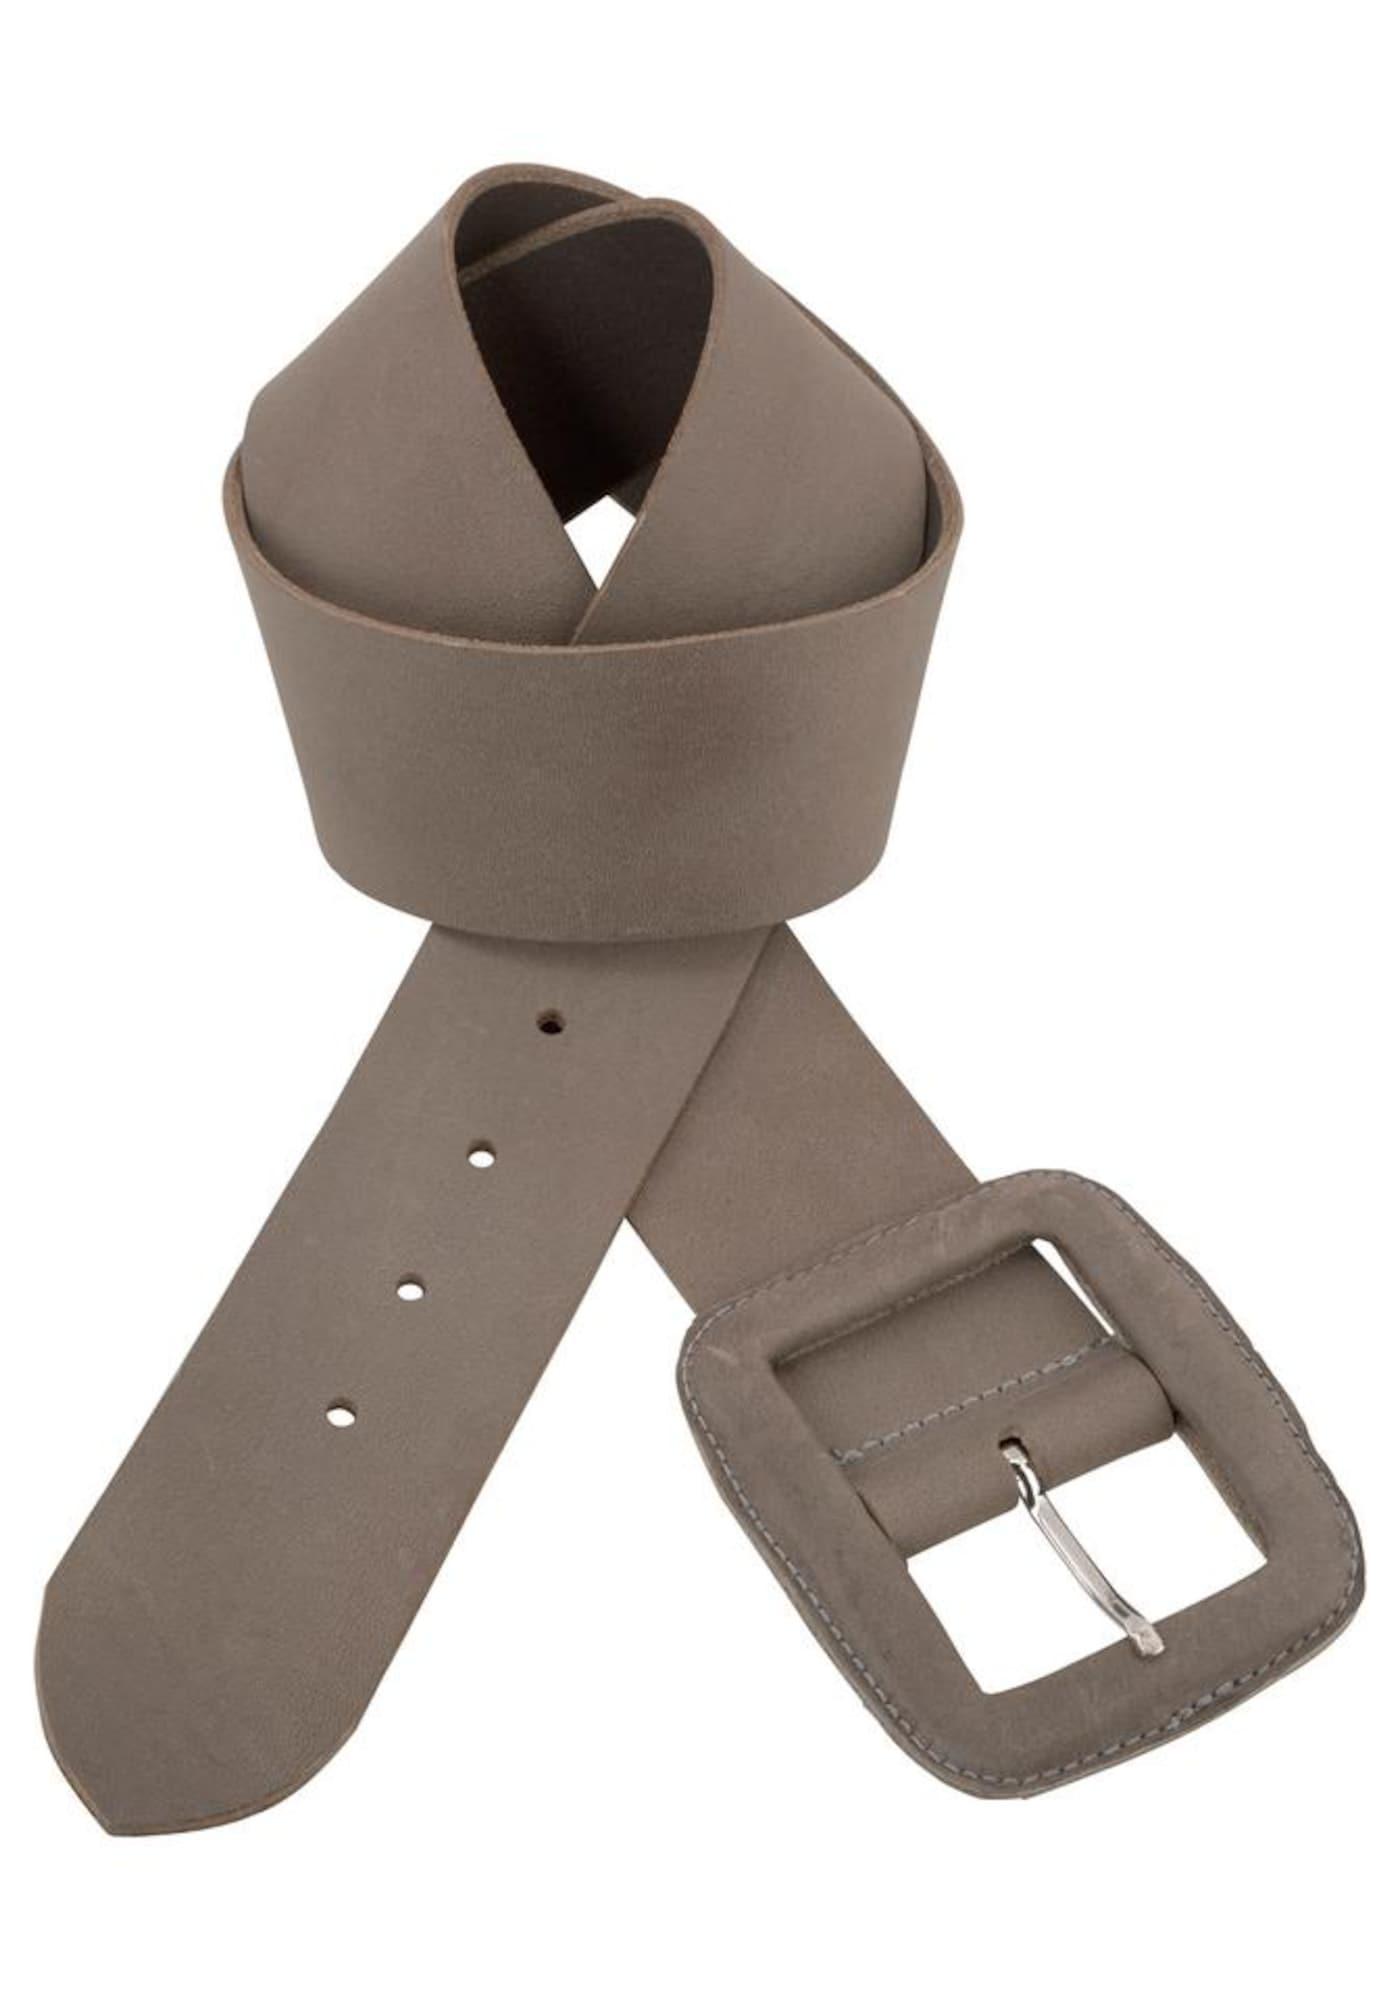 Gürtel | Accessoires > Gürtel | Taupe | J. Jayz